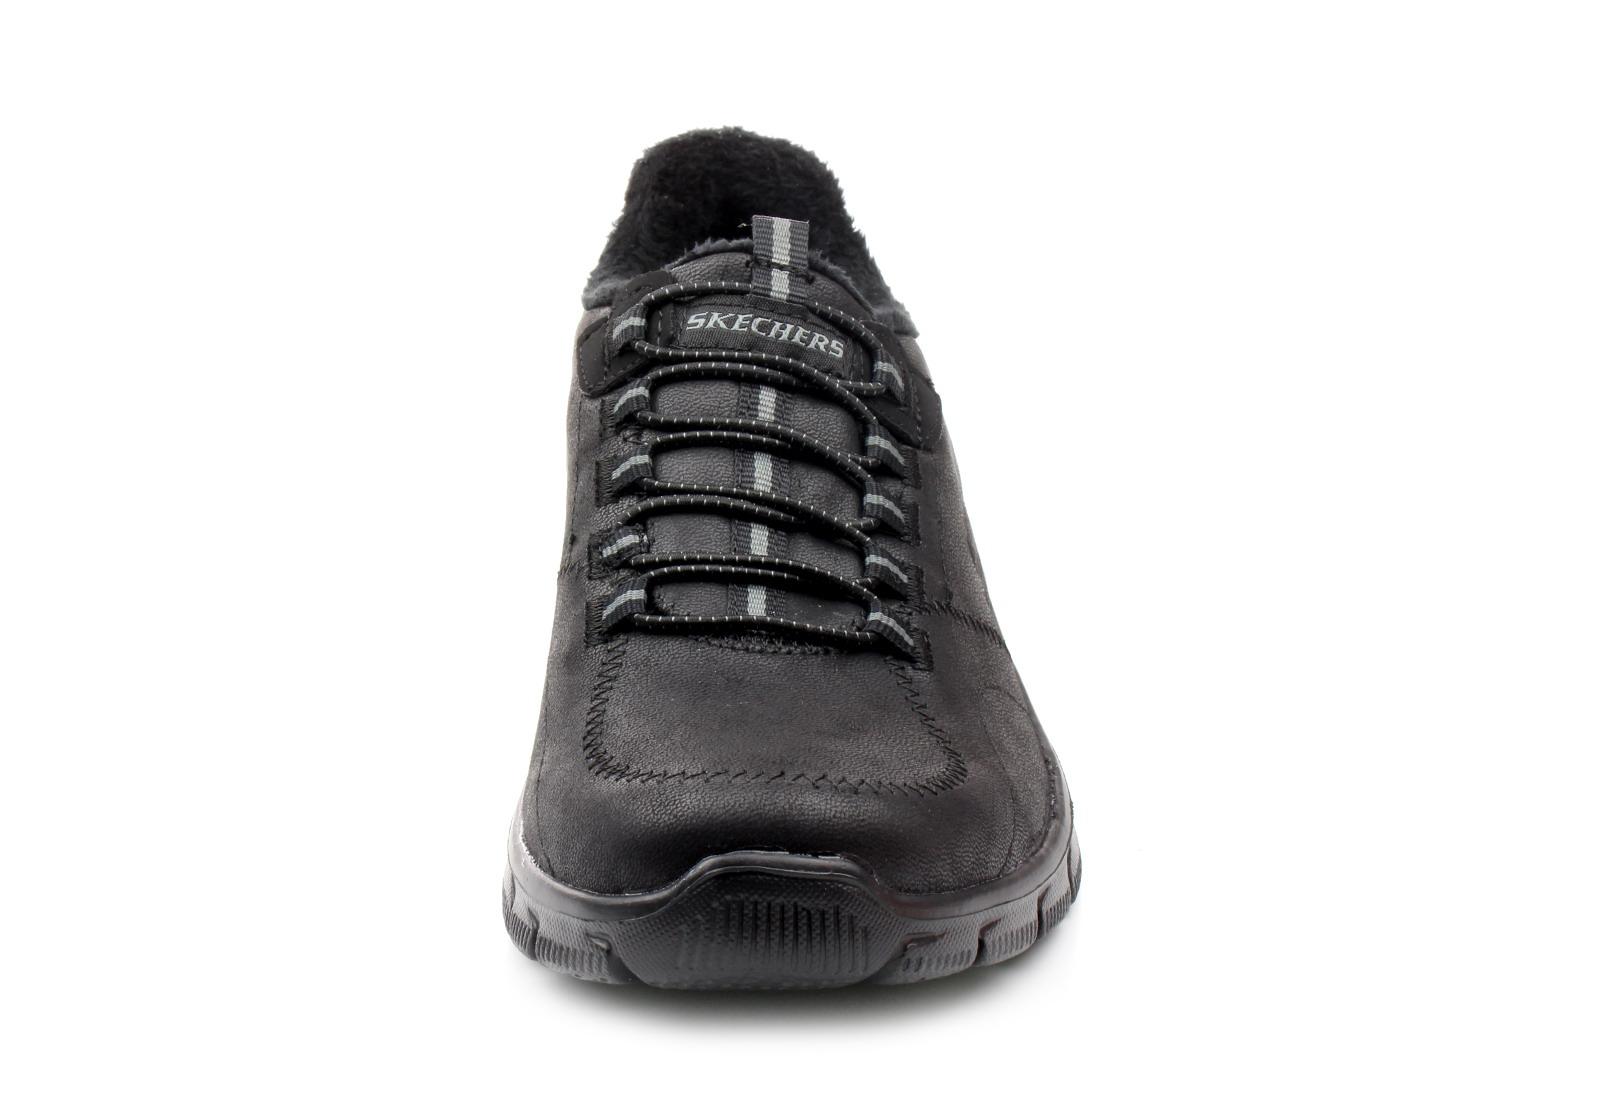 destacar traicionar Hueco  Skechers Memory Foam Crna Patike - Relaxed Fit: Empire - Latest News -  Office Shoes Srbija